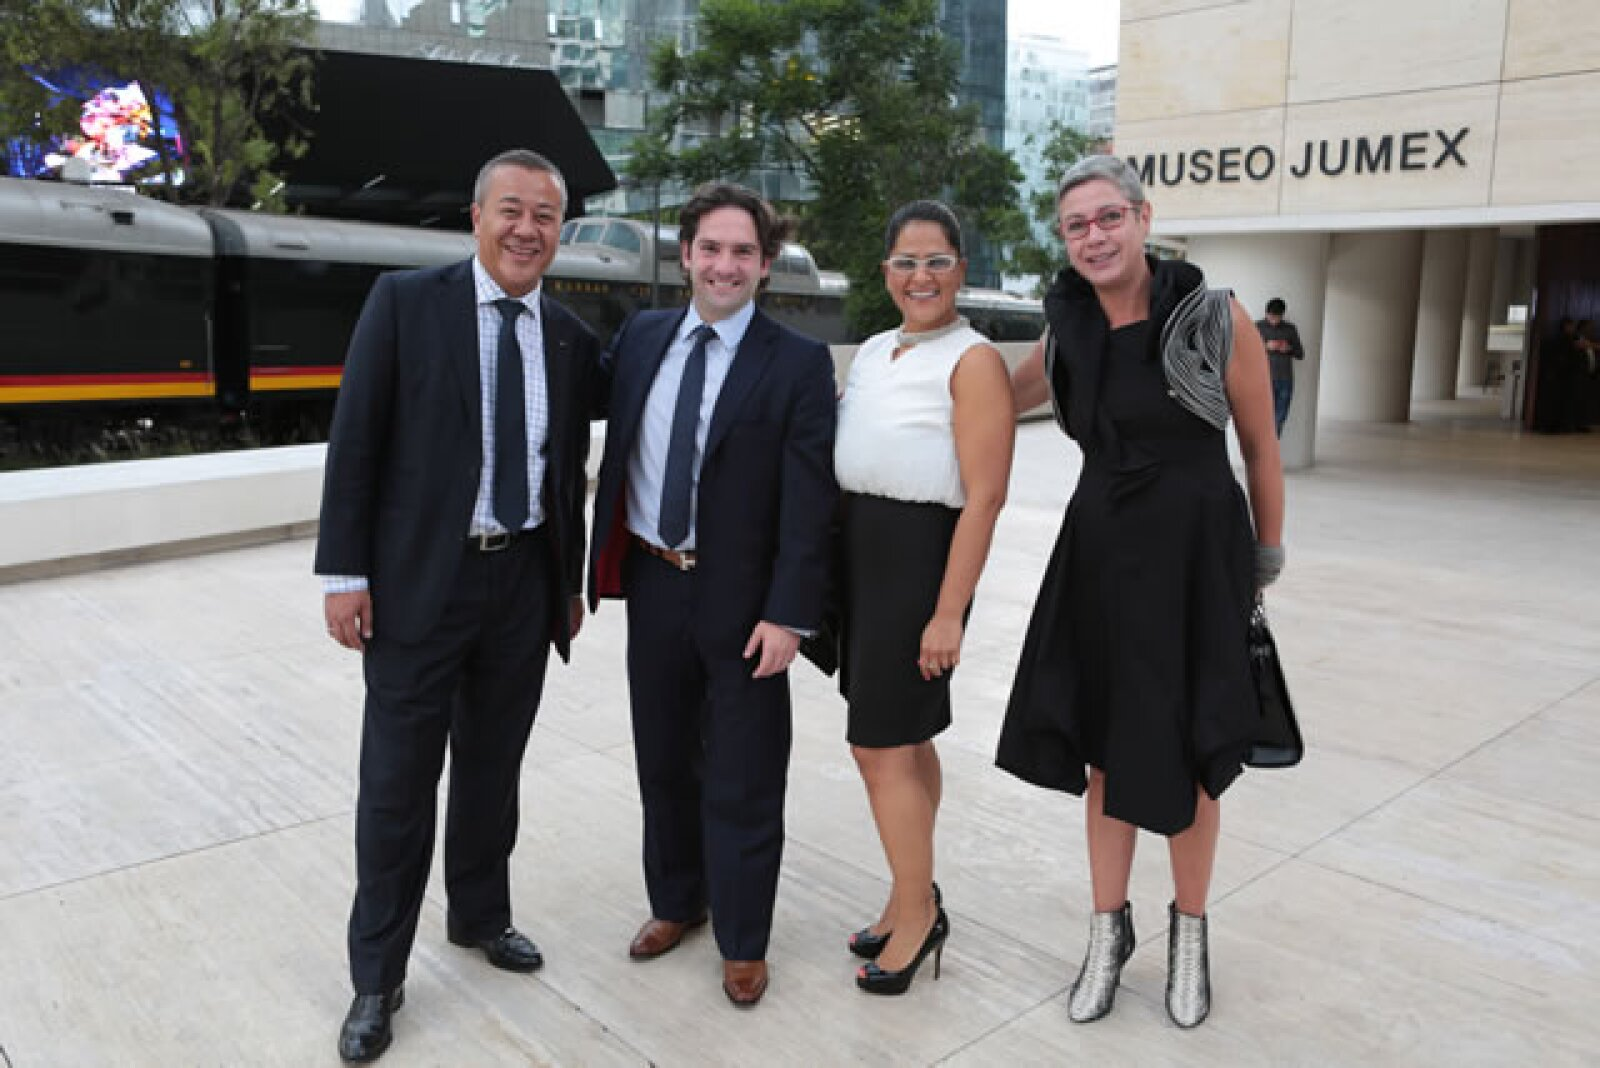 Patrick Fon, Gerardo Fonse, Lucia Alvarez y Christiane Fisher.